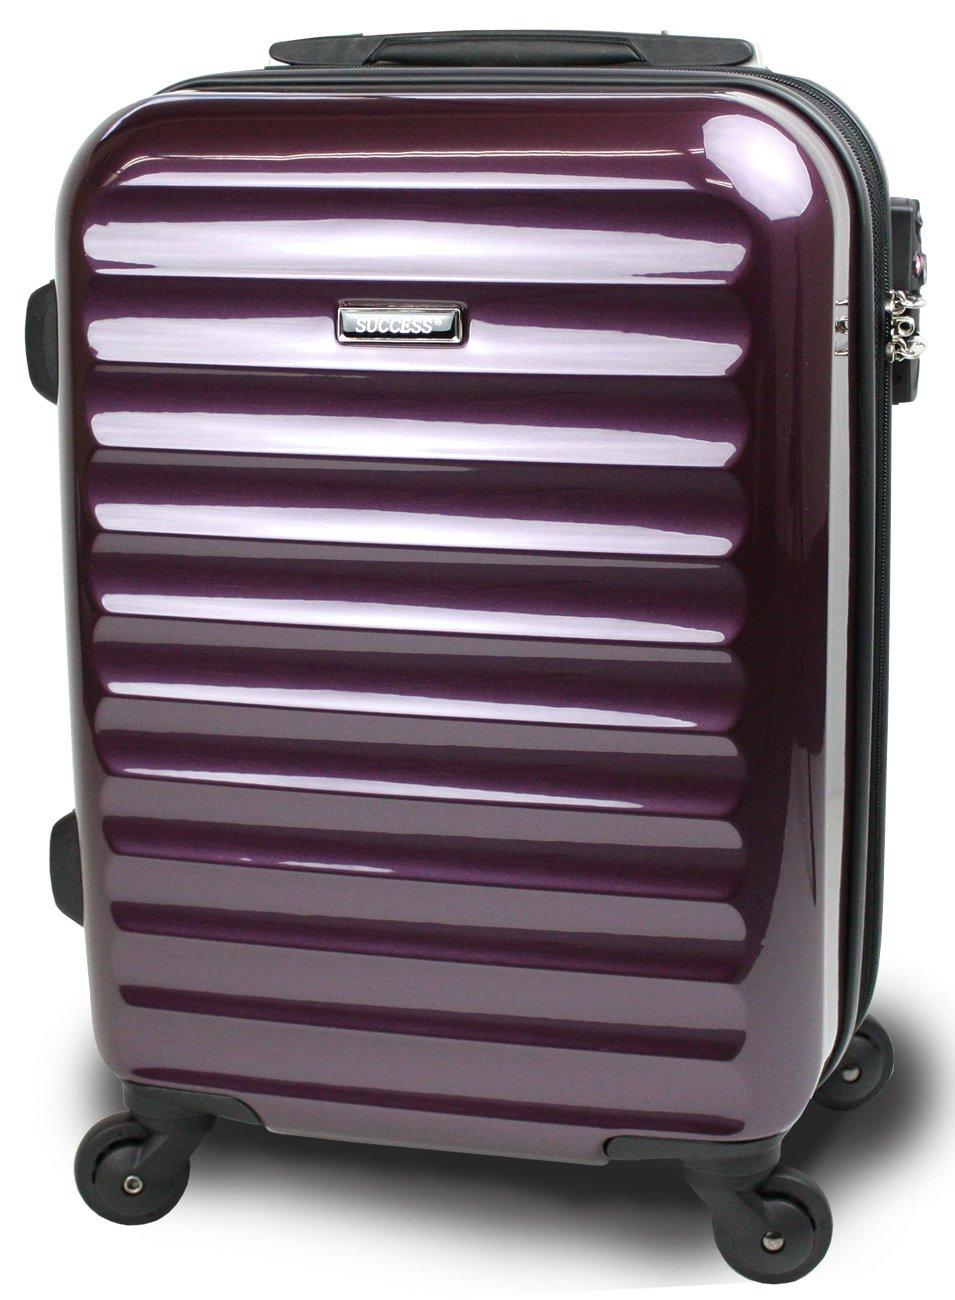 【SUCCESS サクセス】 スーツケース 3サイズ( 大型  中型  小型 ) 超軽量 キャリーバッグ TSAロック 搭載 【 ヴィアーノ2016 ダブルファスナーモデル 】 鏡面ミラー加工 B00CLR8CM8 中型 67cm|ディープパープル ディープパープル 中型 67cm